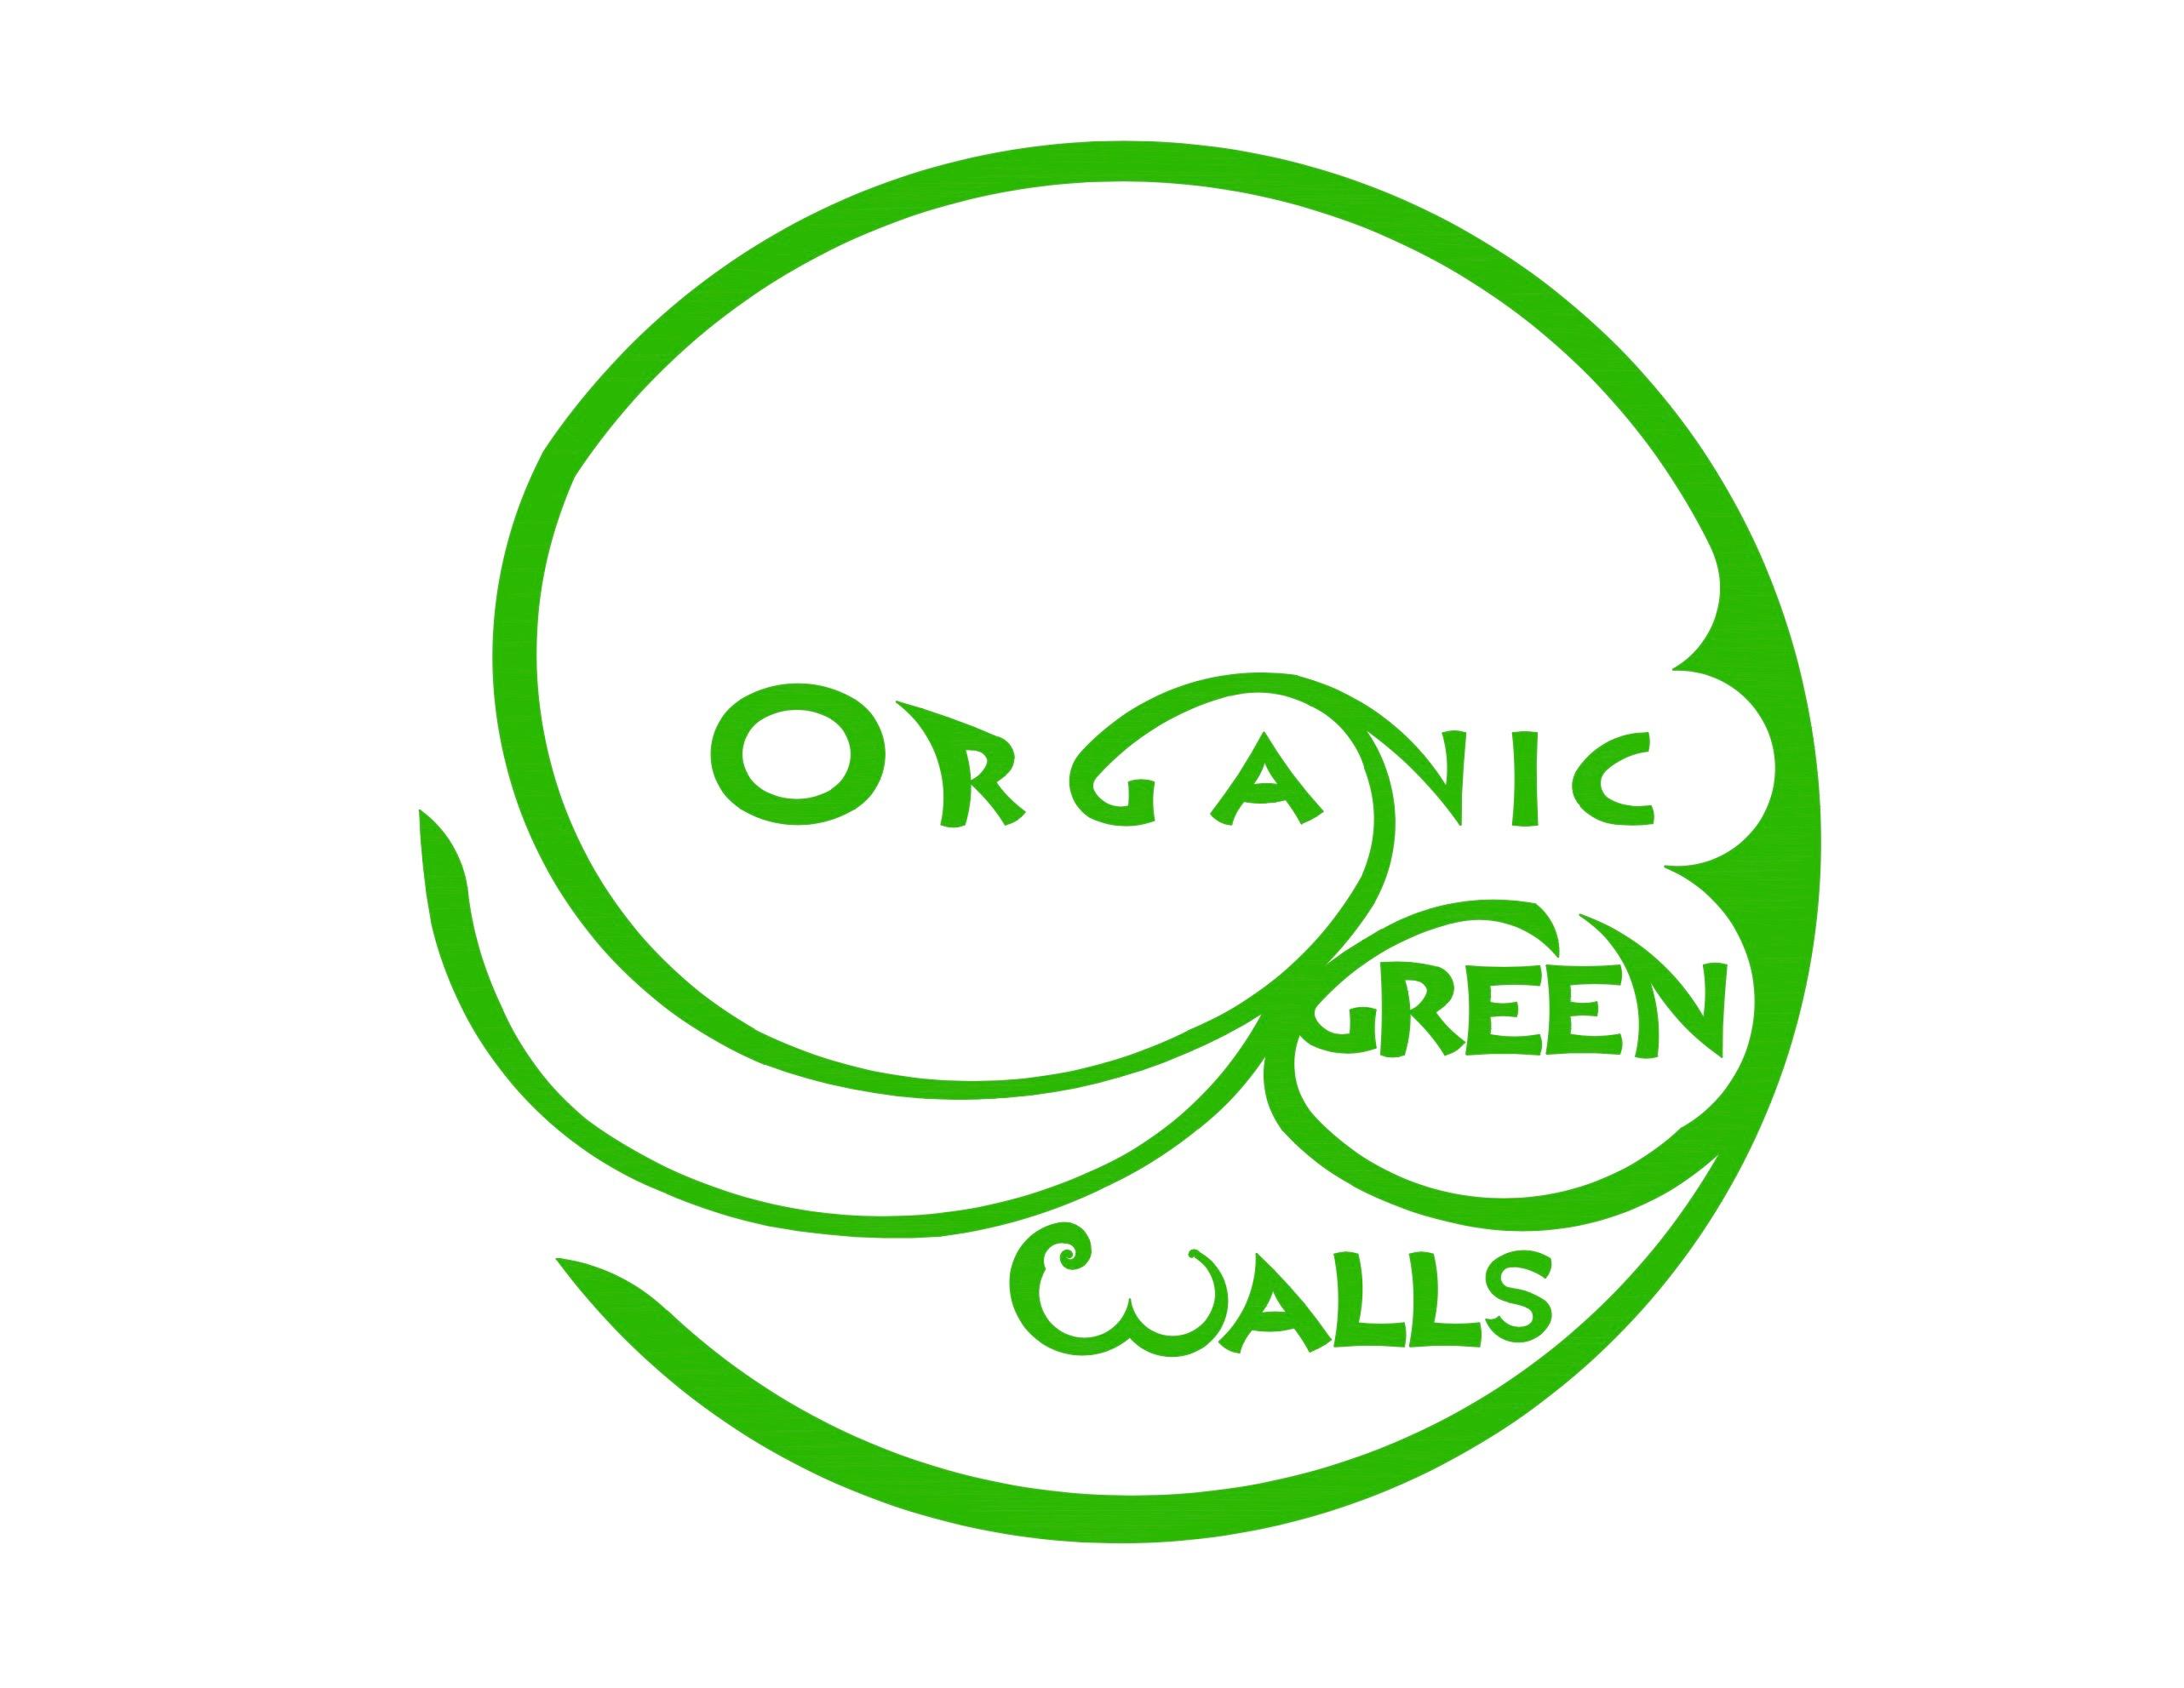 Organic Green Walls Corp is Living walls or Vertical Gardens